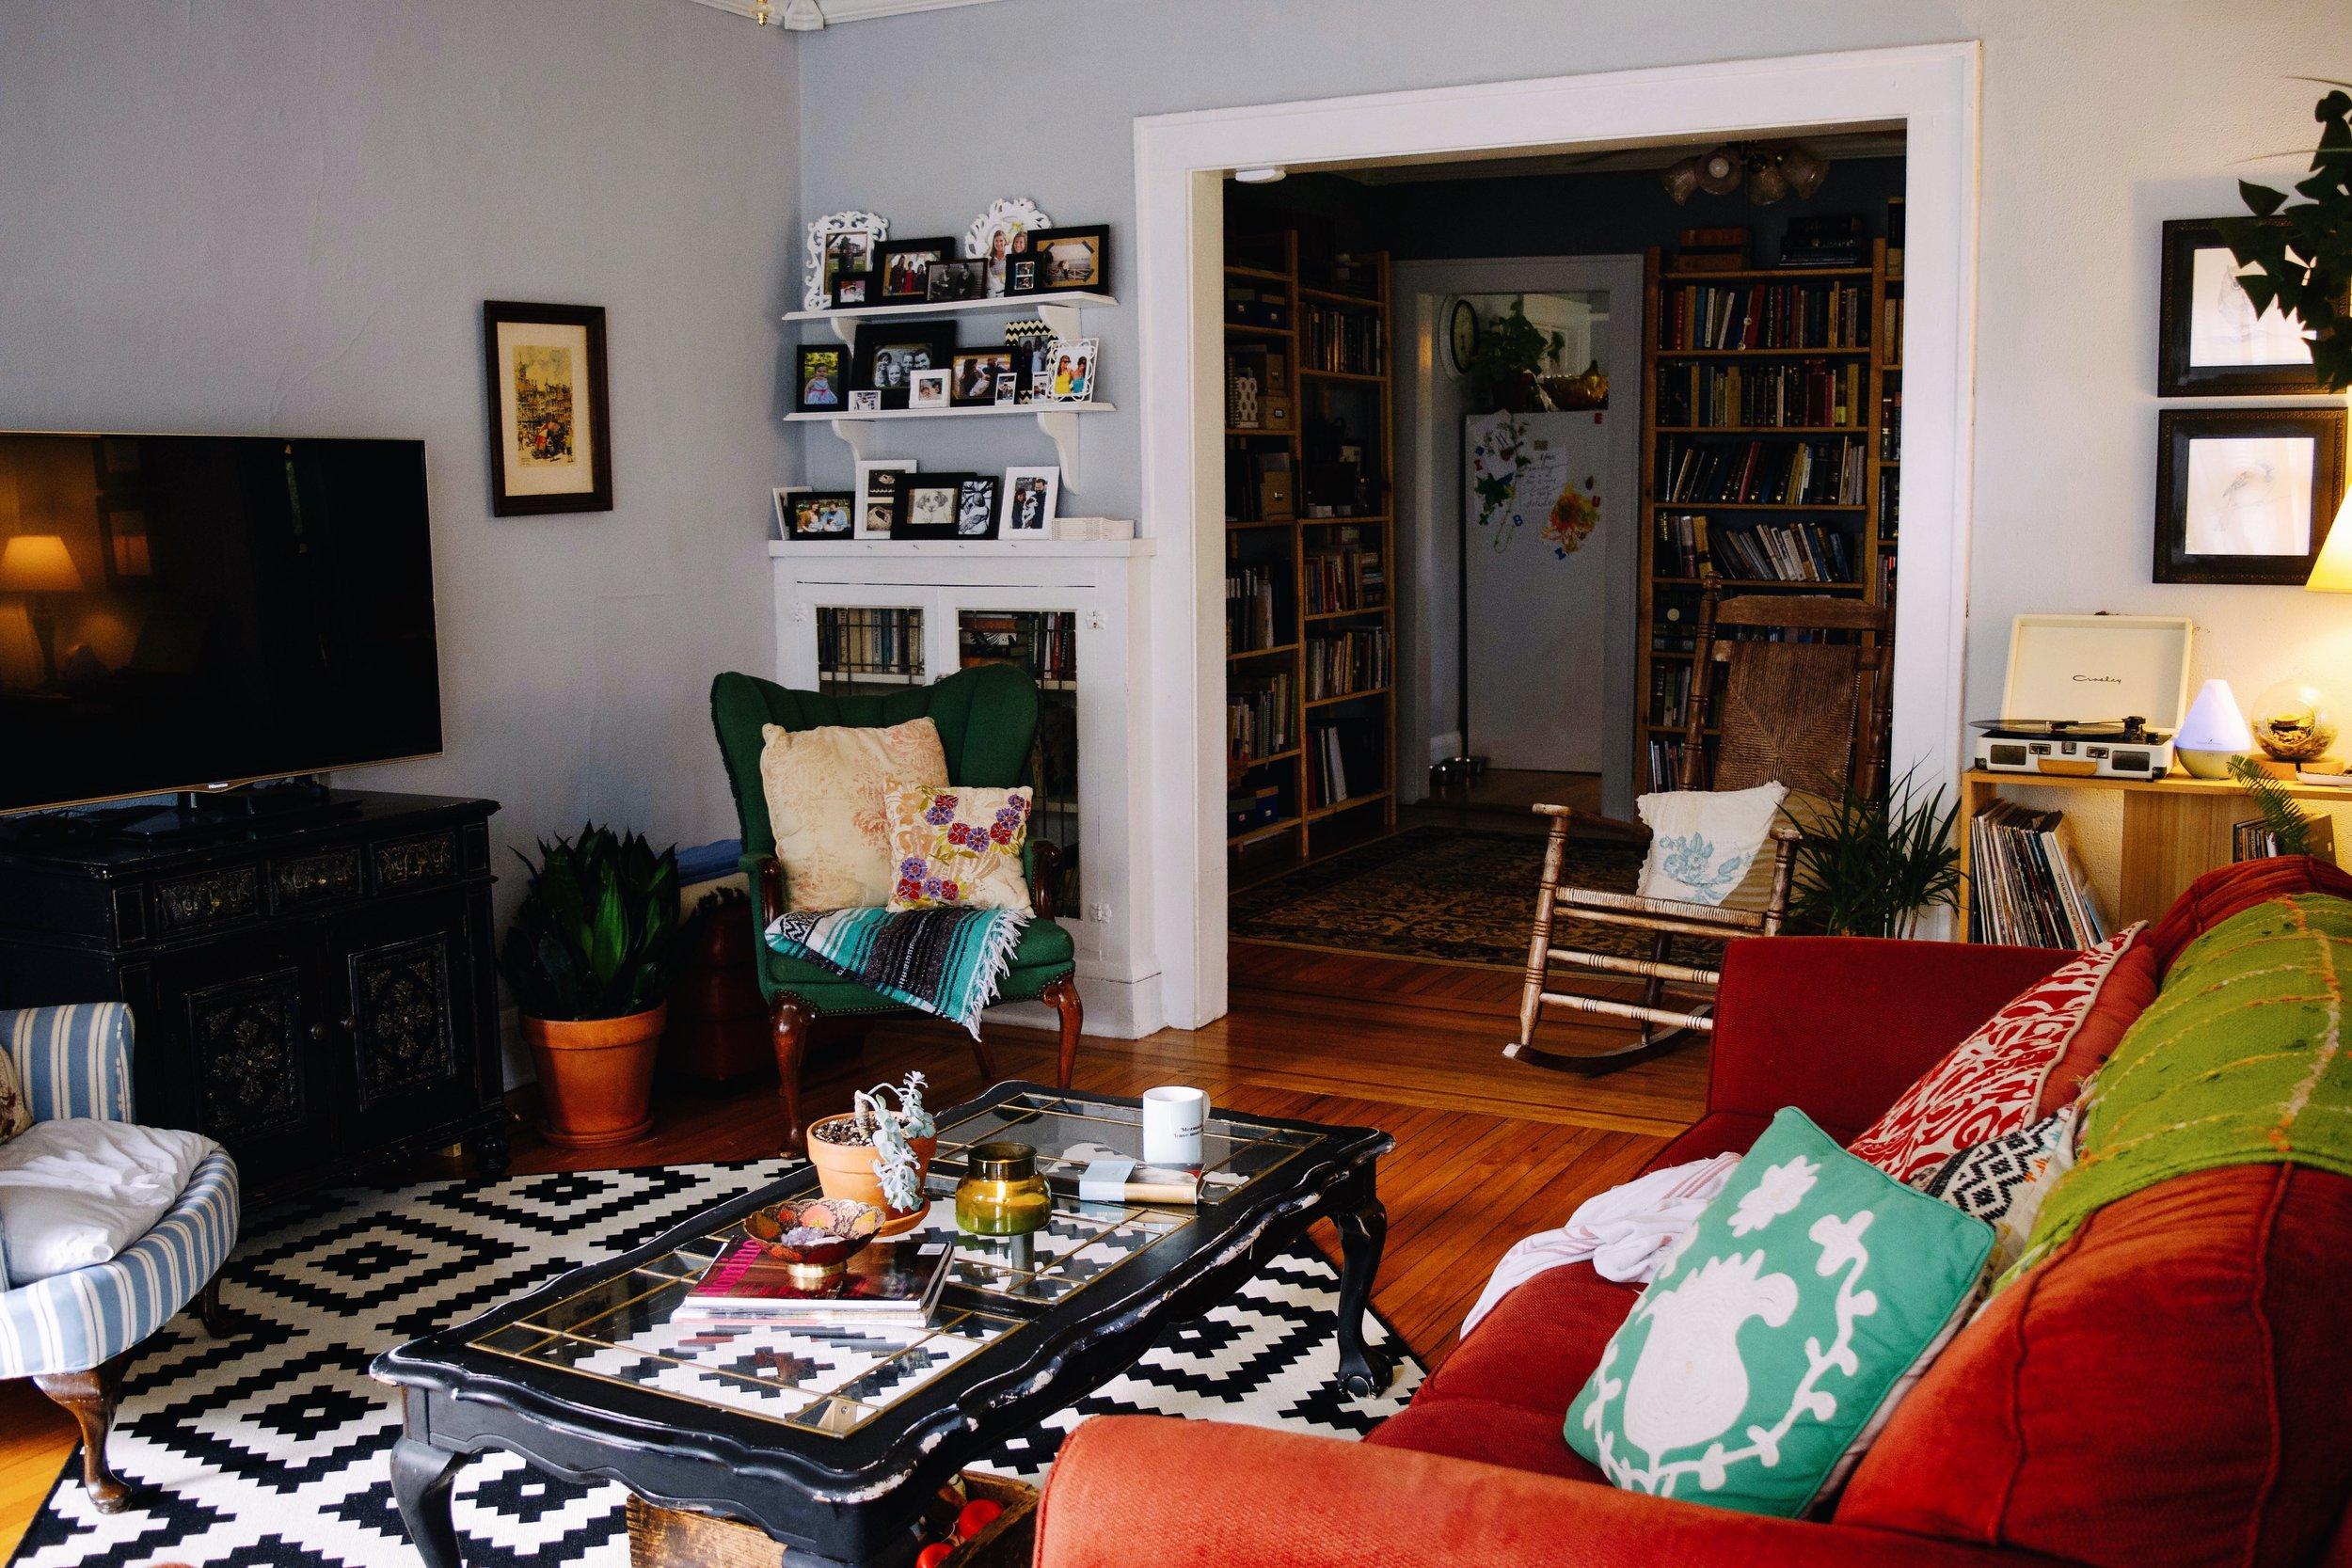 LIVING ROOM (BEFORE & AFTER) (Via: JacinthaPayne)